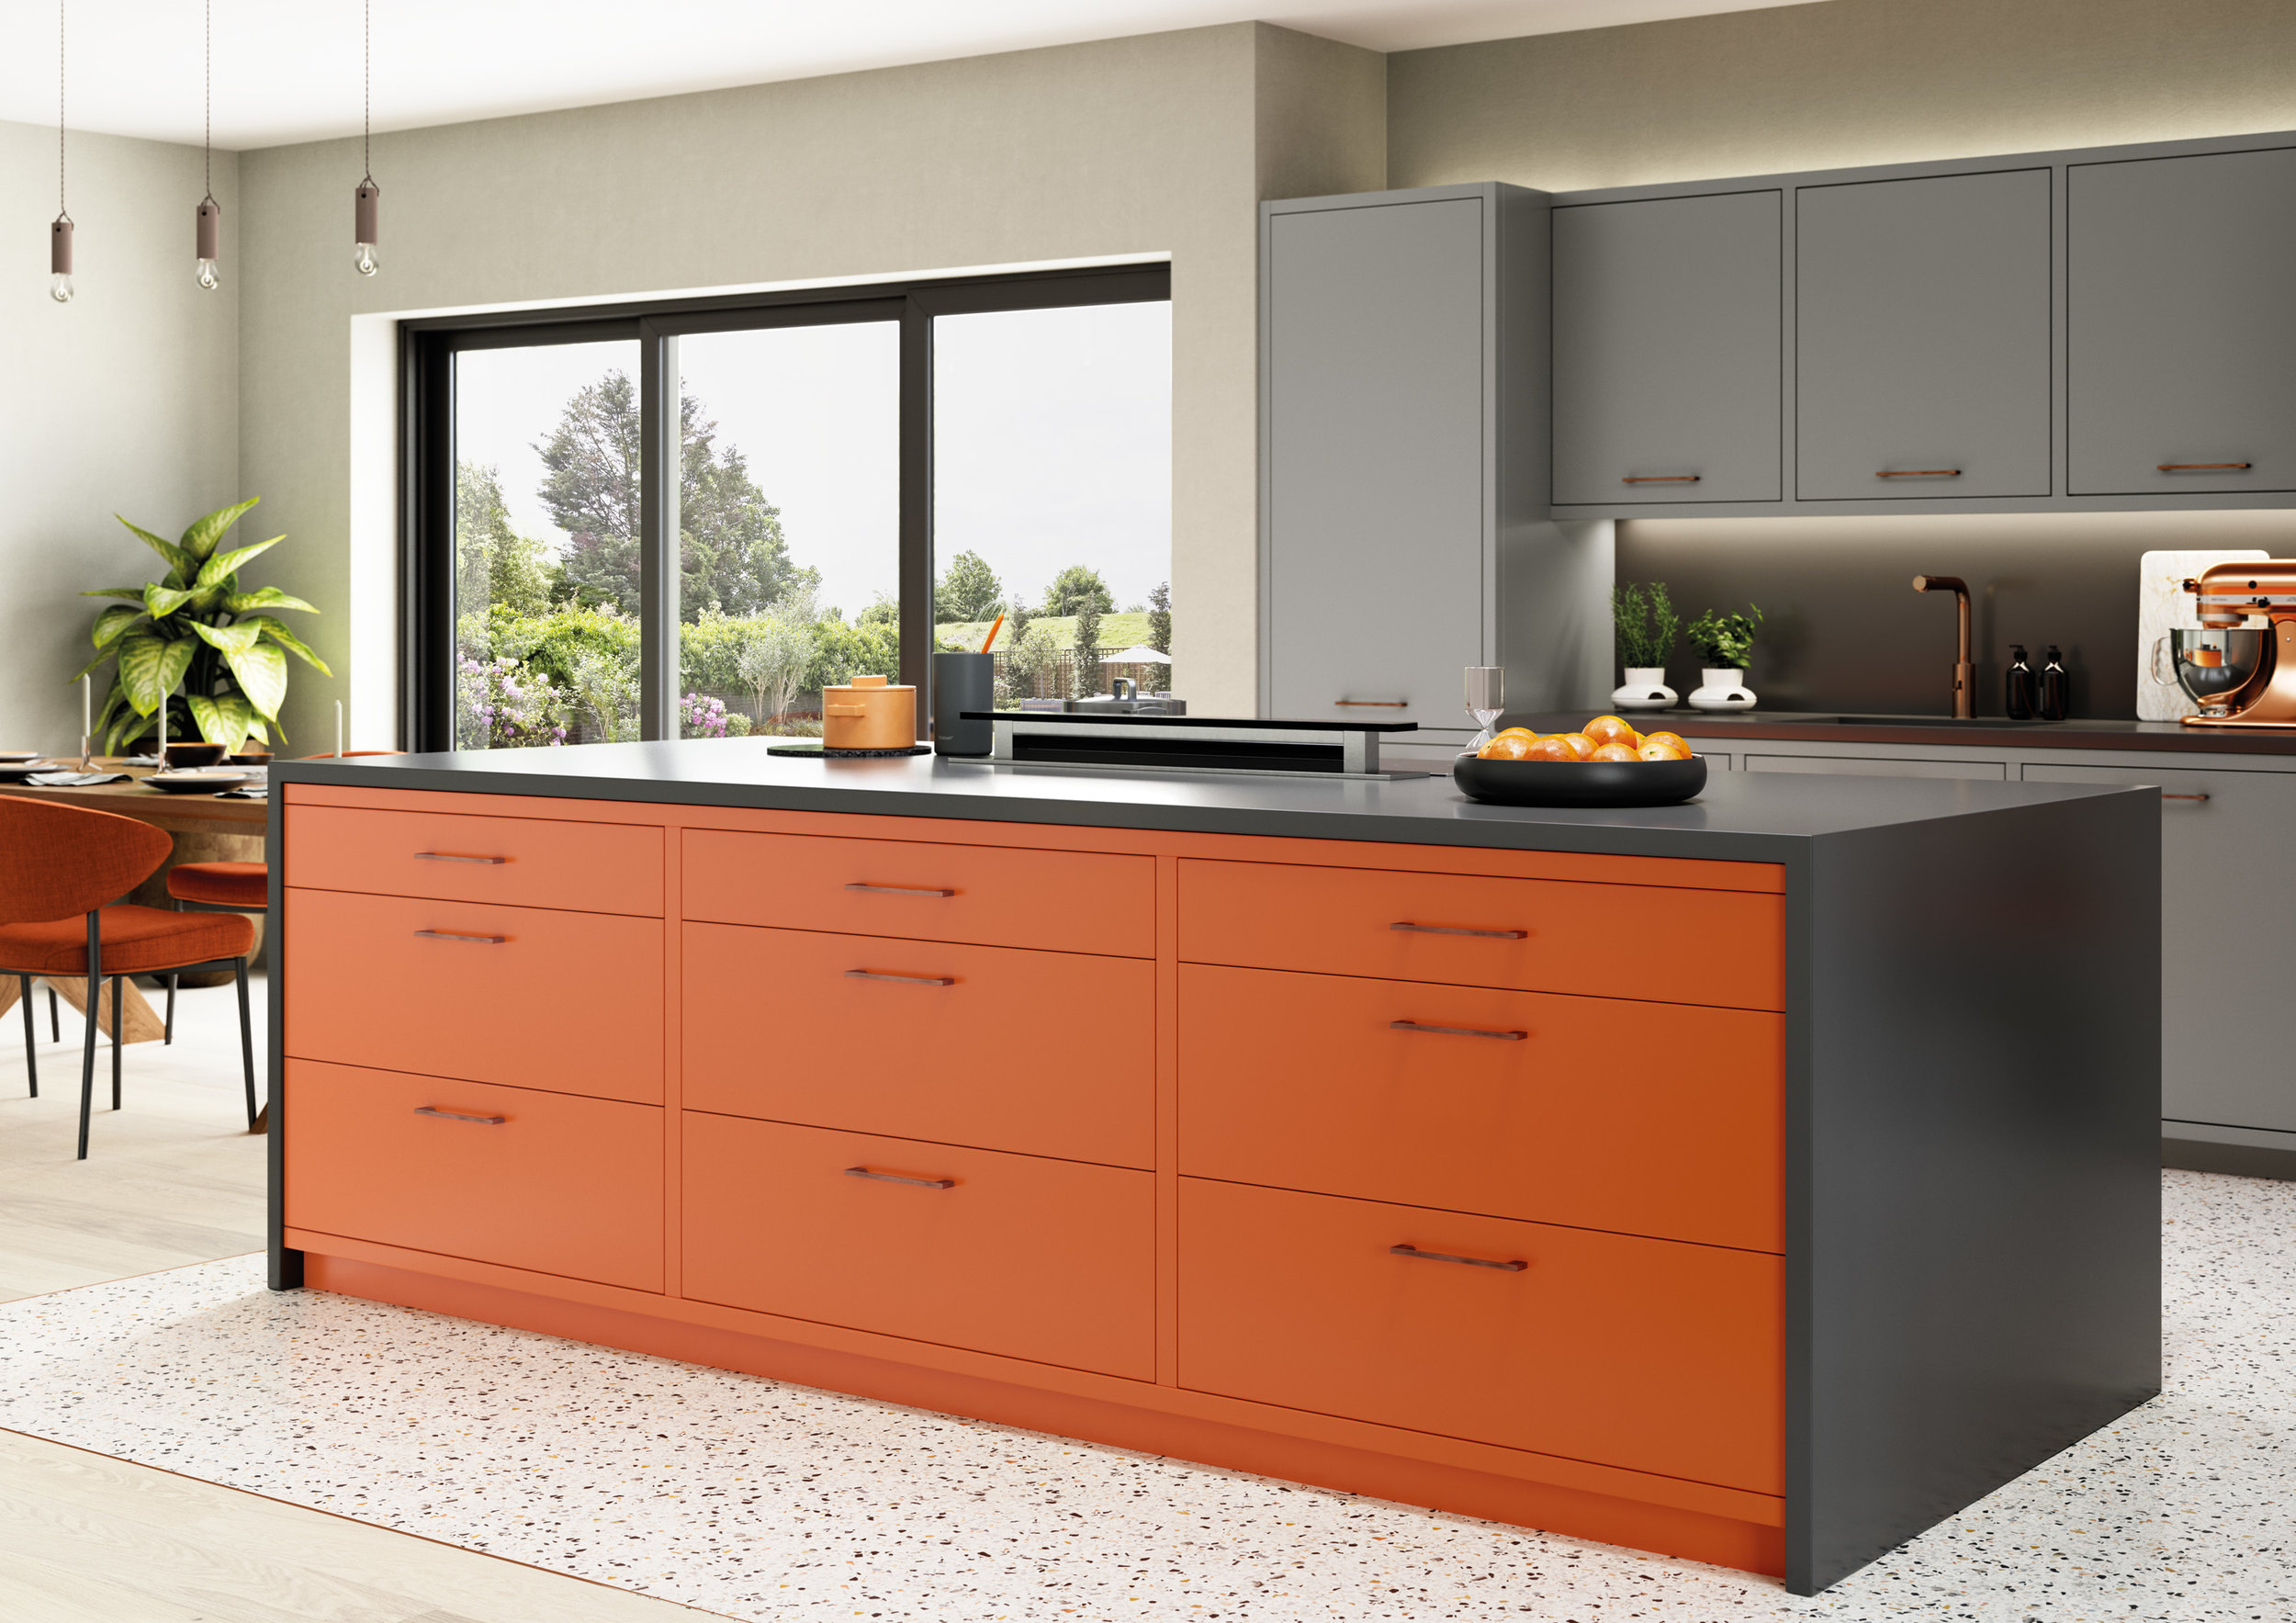 Zola CMS Orange Dust Grey and Graphite_Cameo 2.jpg